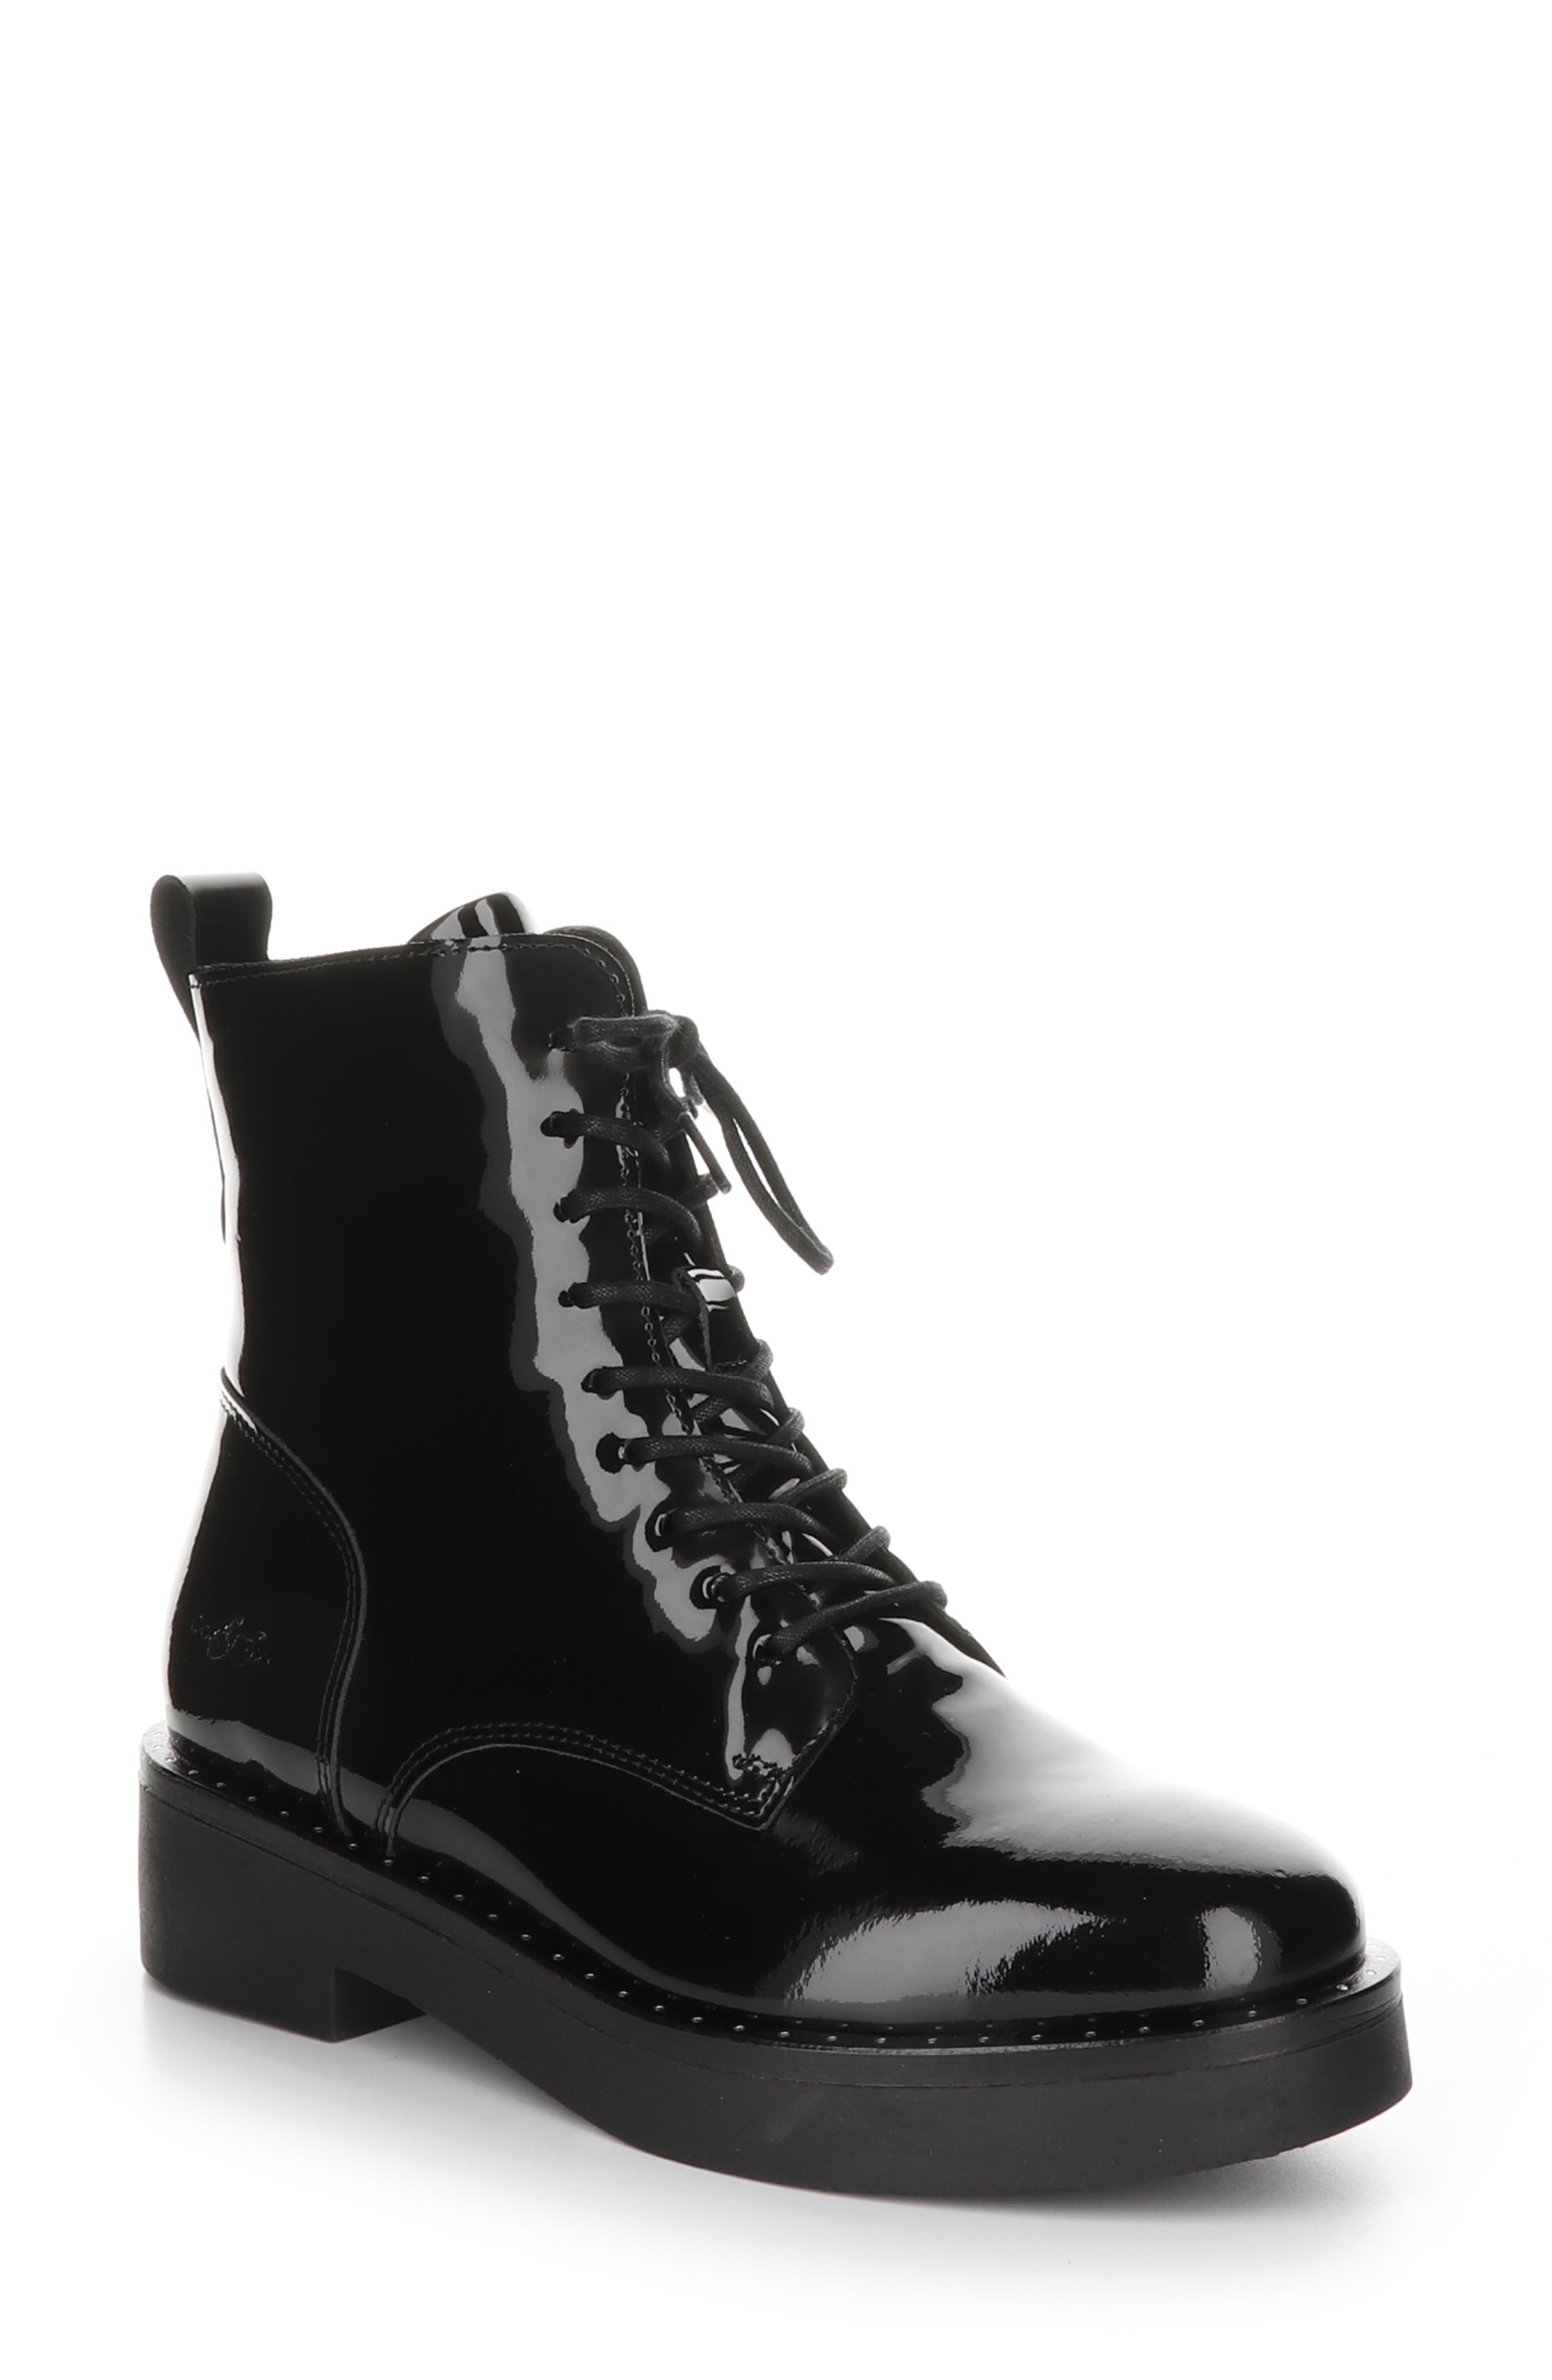 Friend Waterproof Lace-Up Boot